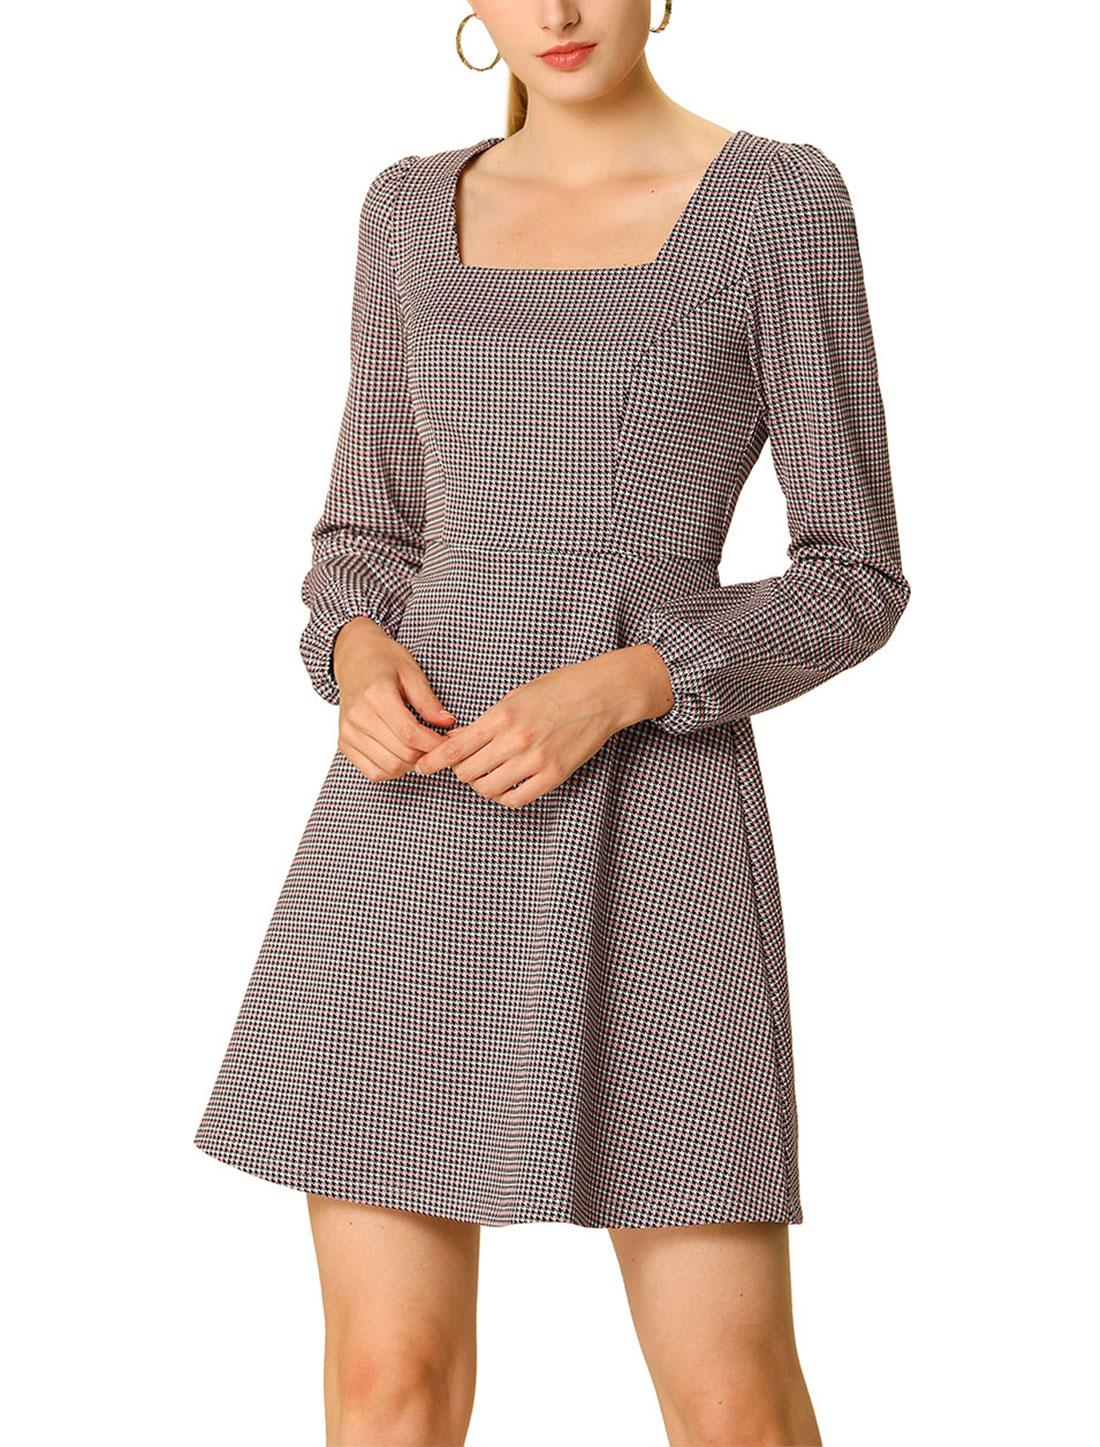 Allegra K Women's Fall Square Neck Vintage Mini Plaid Dress Pink L